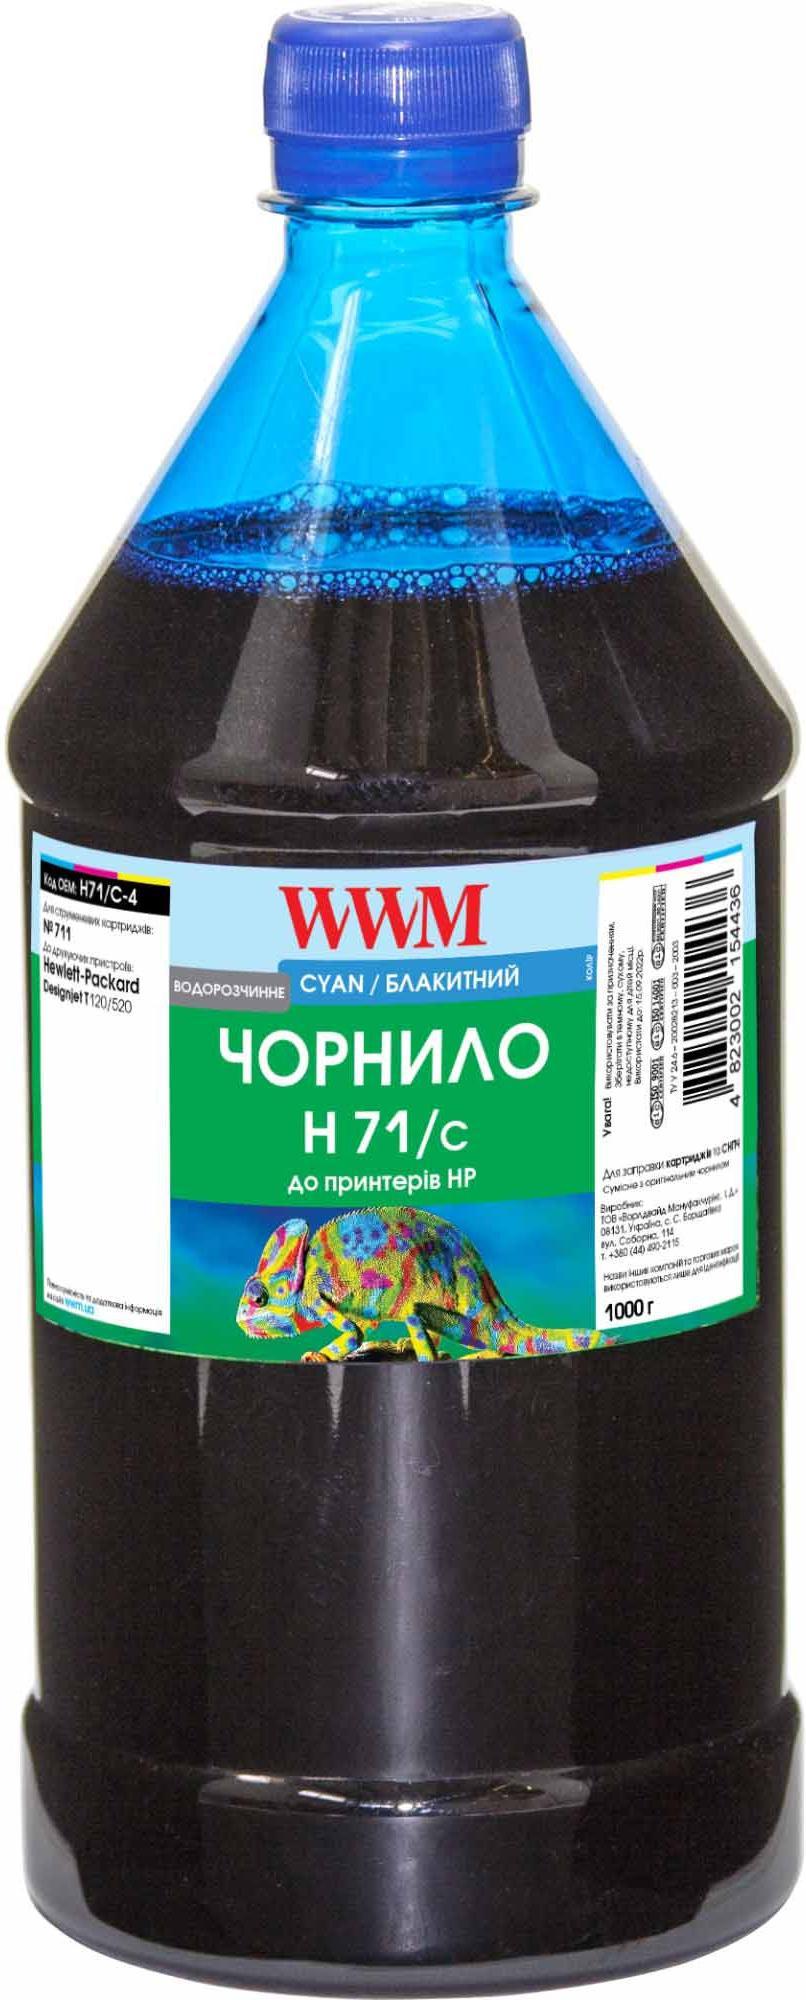 Купить Чорнило WWM for HP №711 1000g Cyan (H71/C-4)